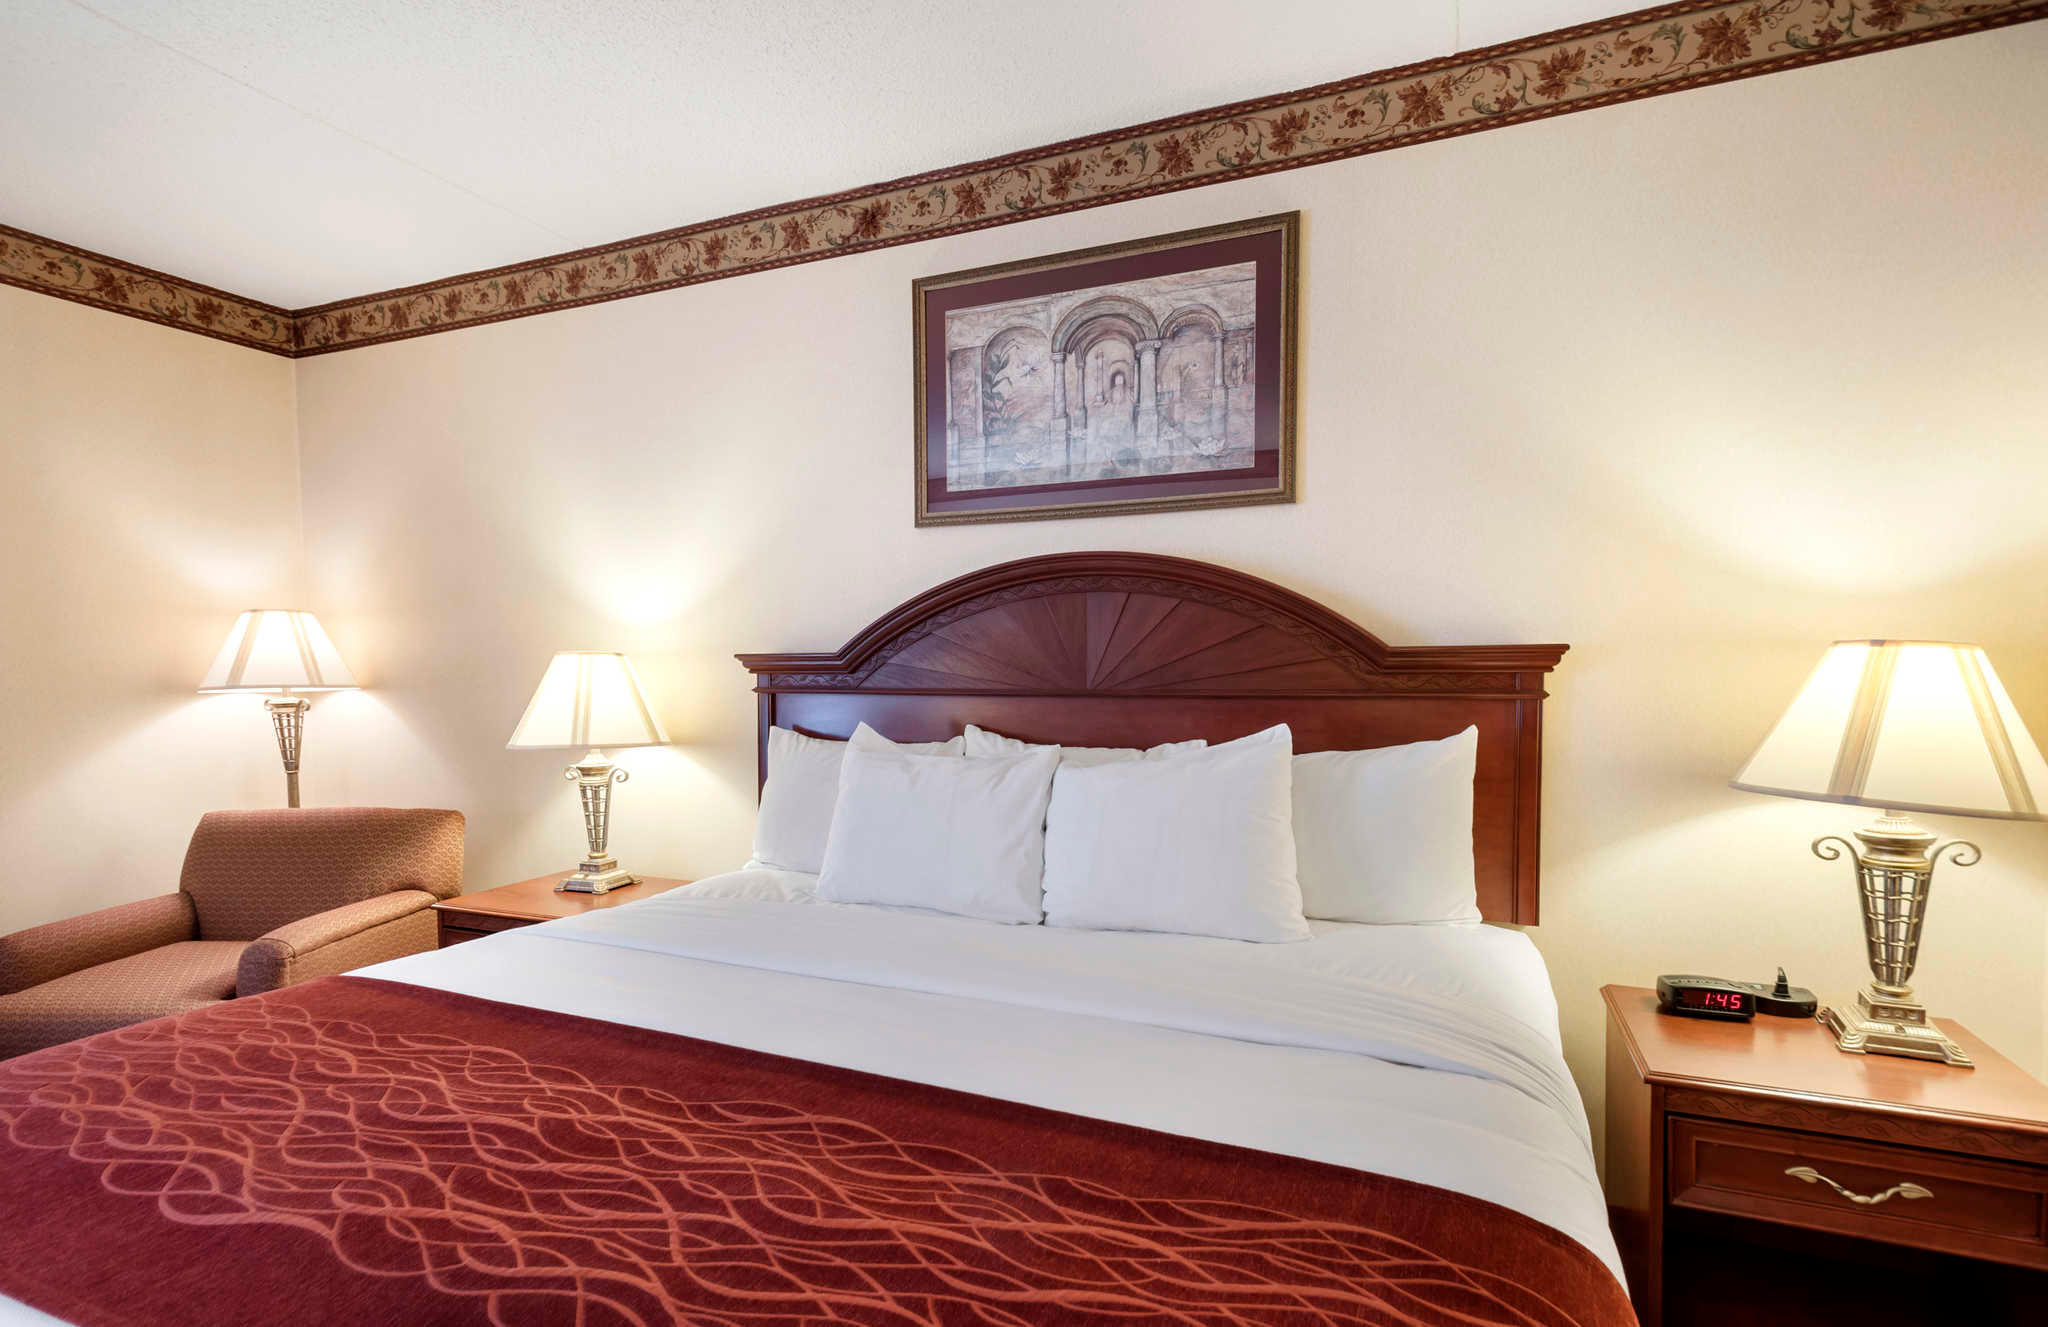 Comfort Inn & Suites Edgewood - Aberdeen image 15